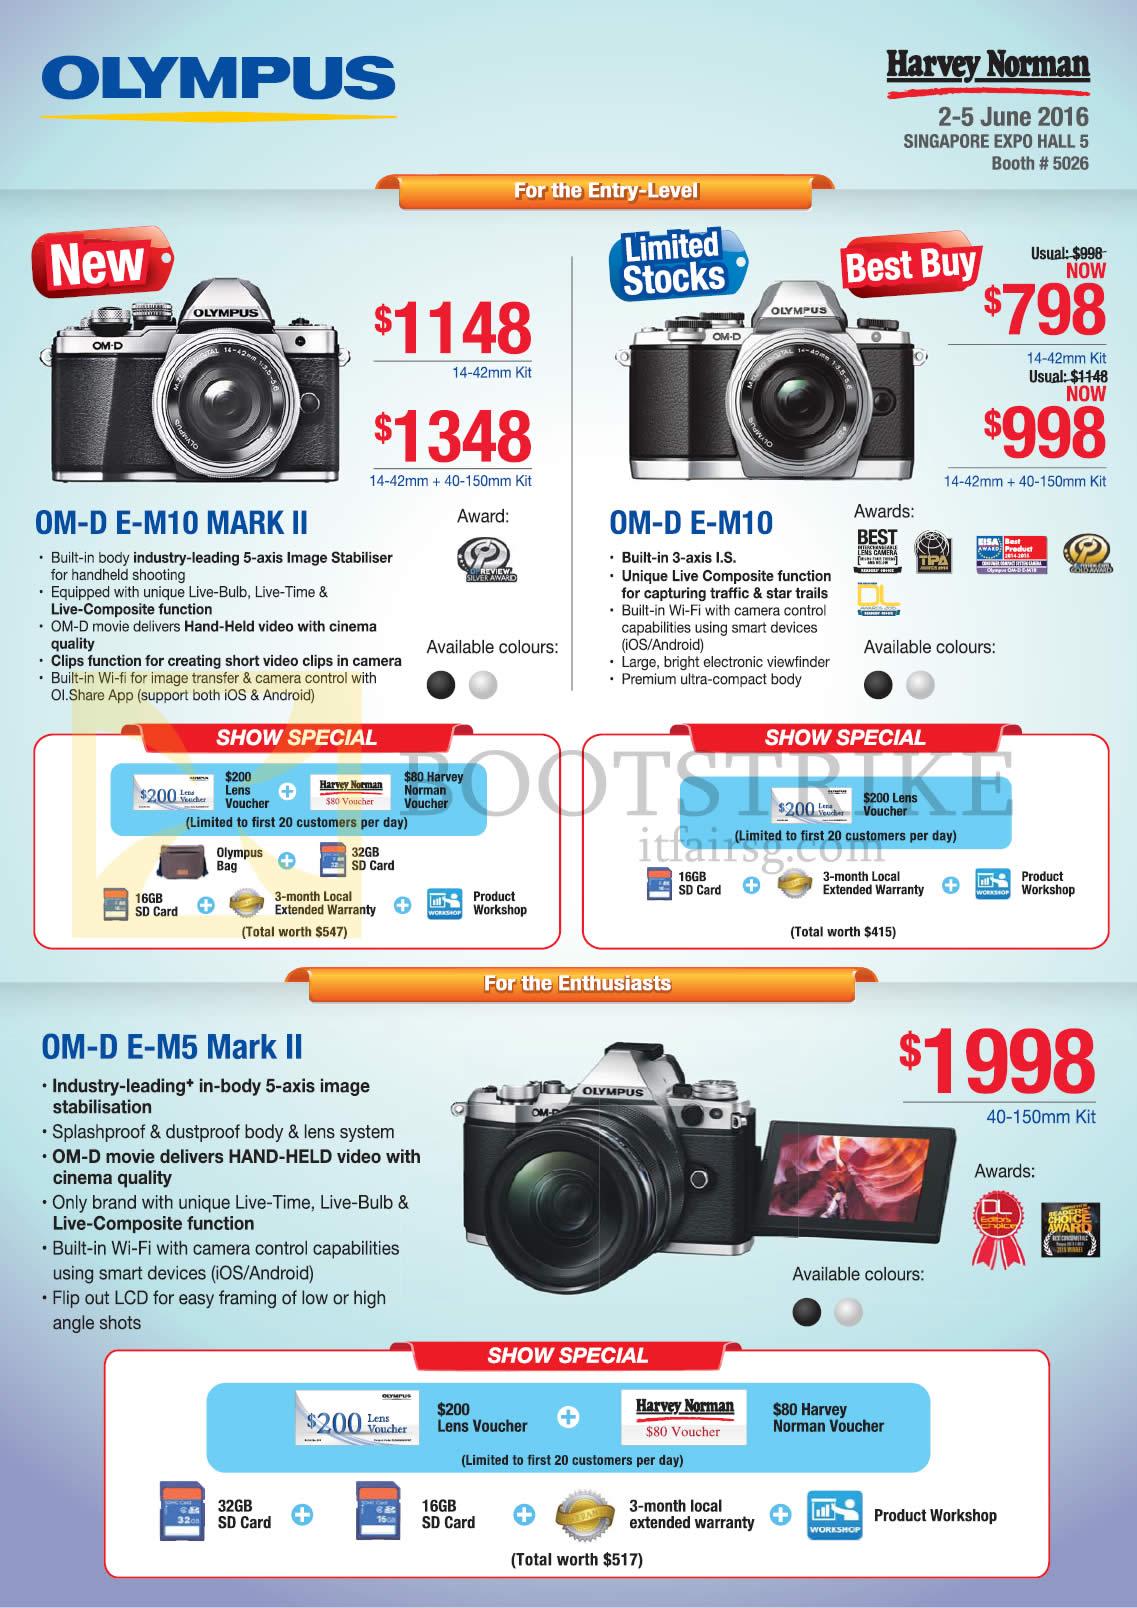 PC SHOW 2016 price list image brochure of Olympus Digital Cameras OM-D E-M10 Mark II, OM-D E-M10, OM-D E-M5 Mark II